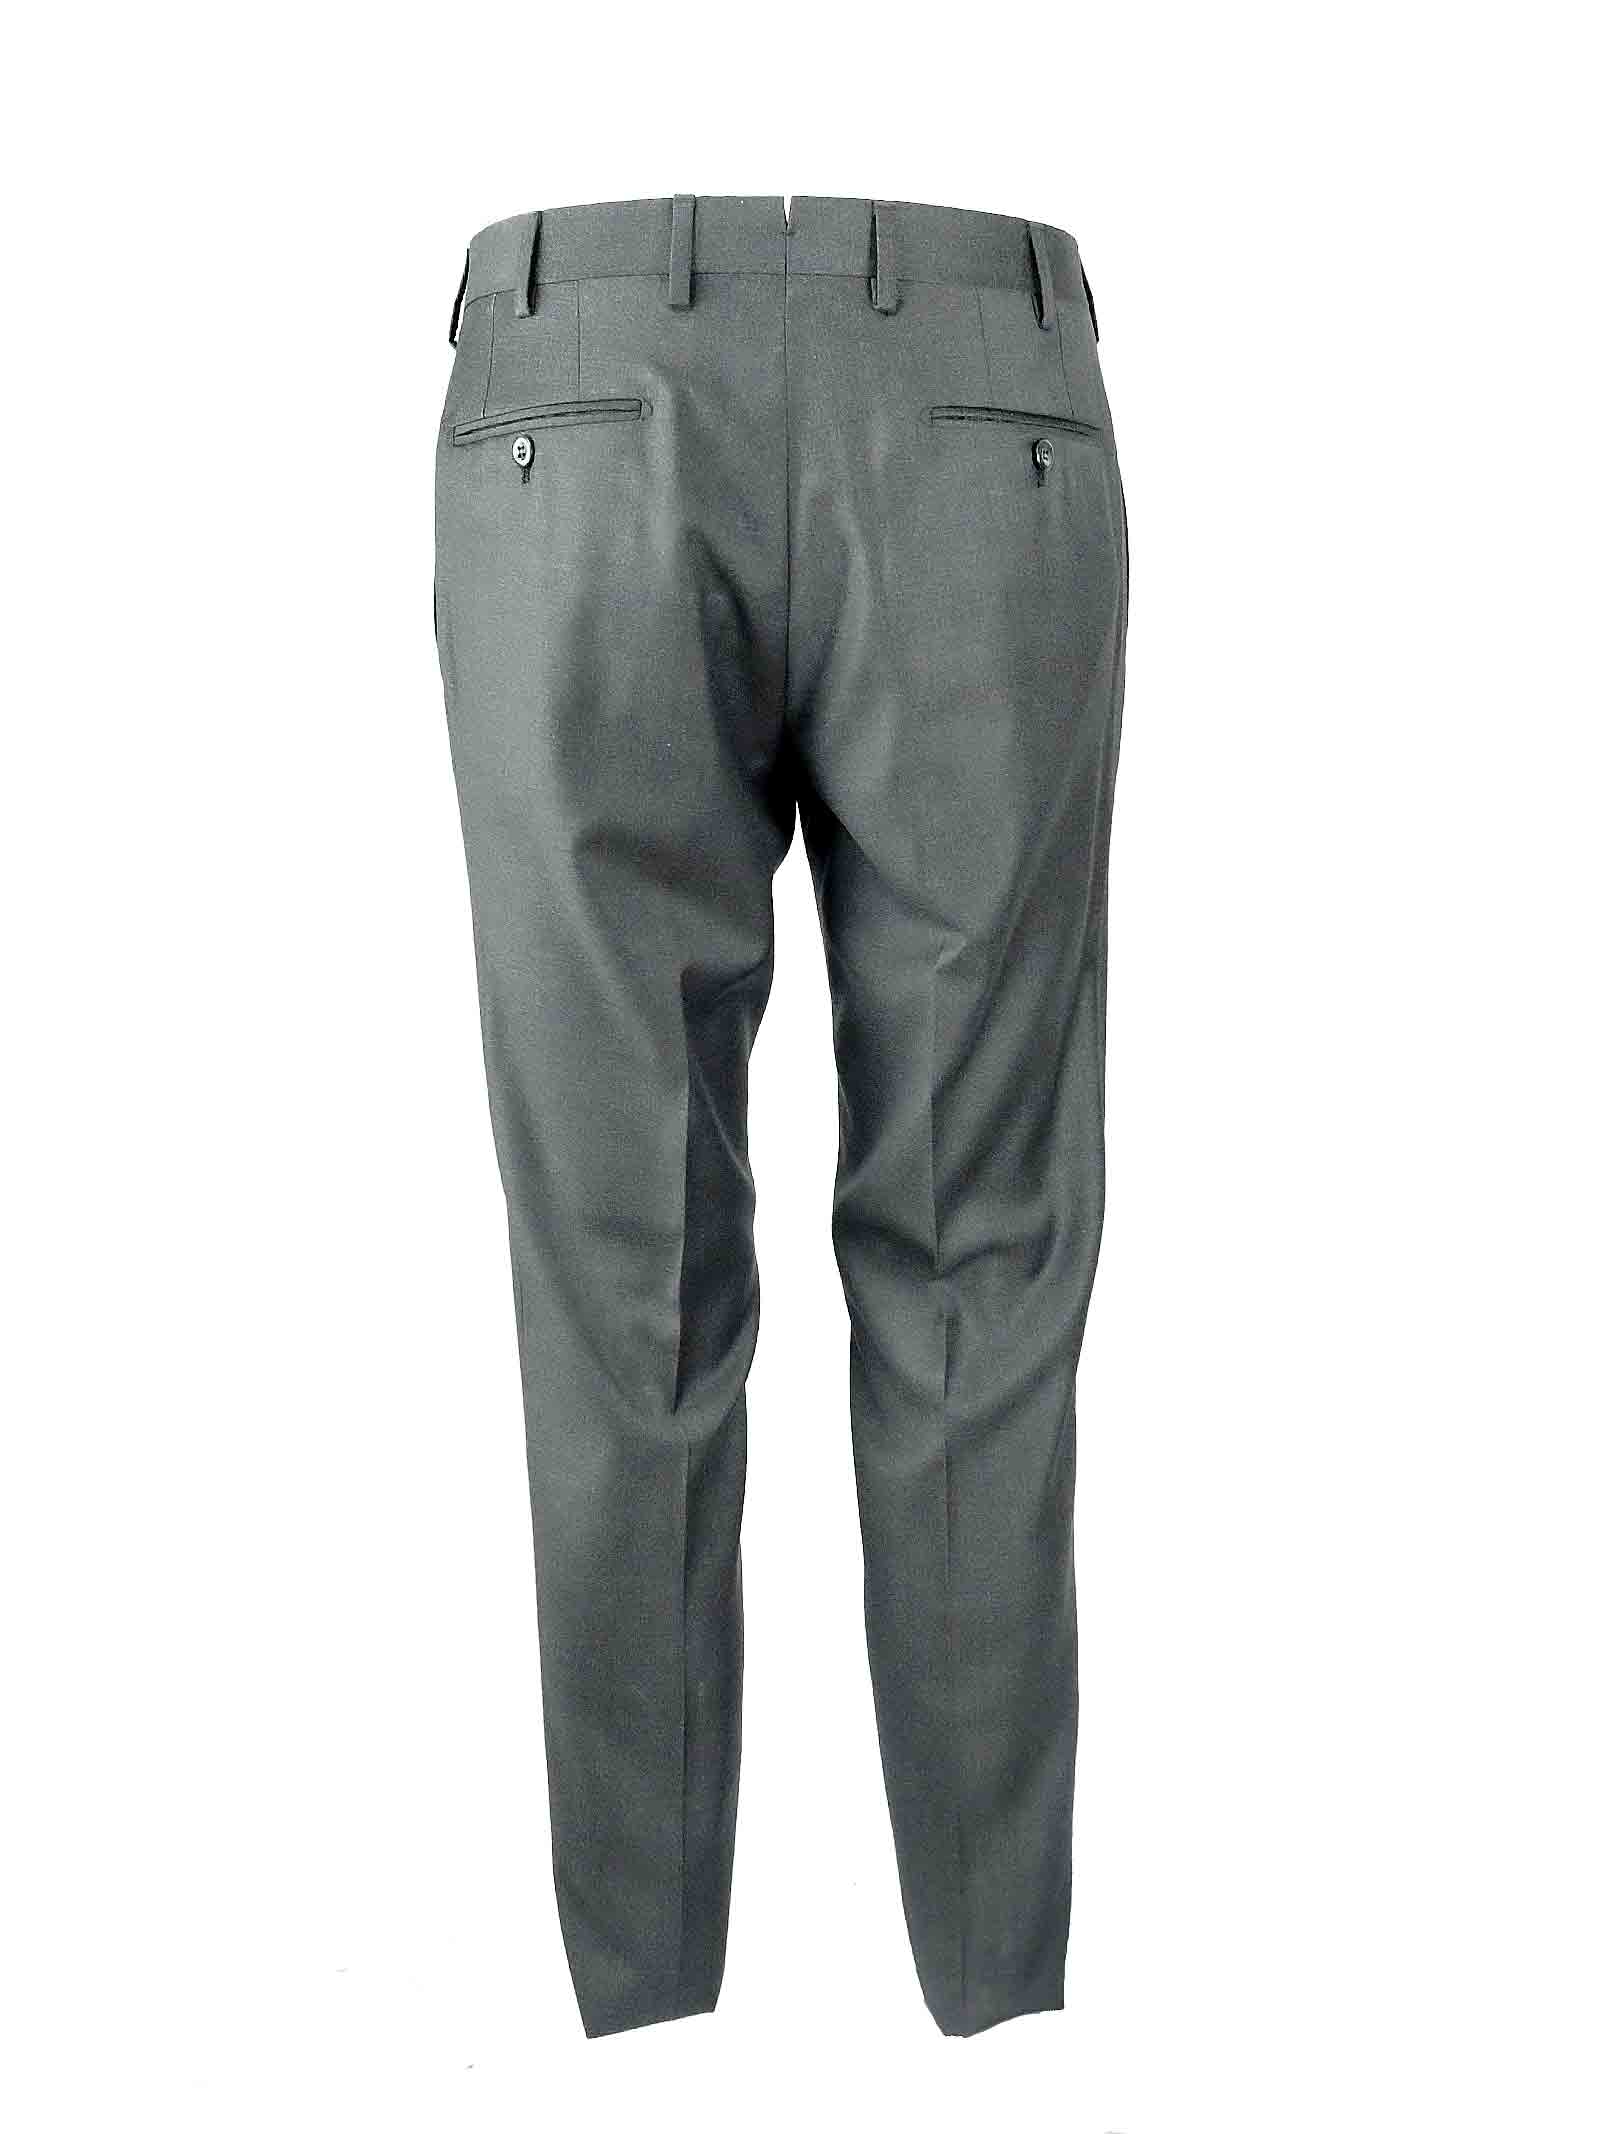 TASMANIAN PANTS PANAMA JACKET | Trousers | 4512 251593